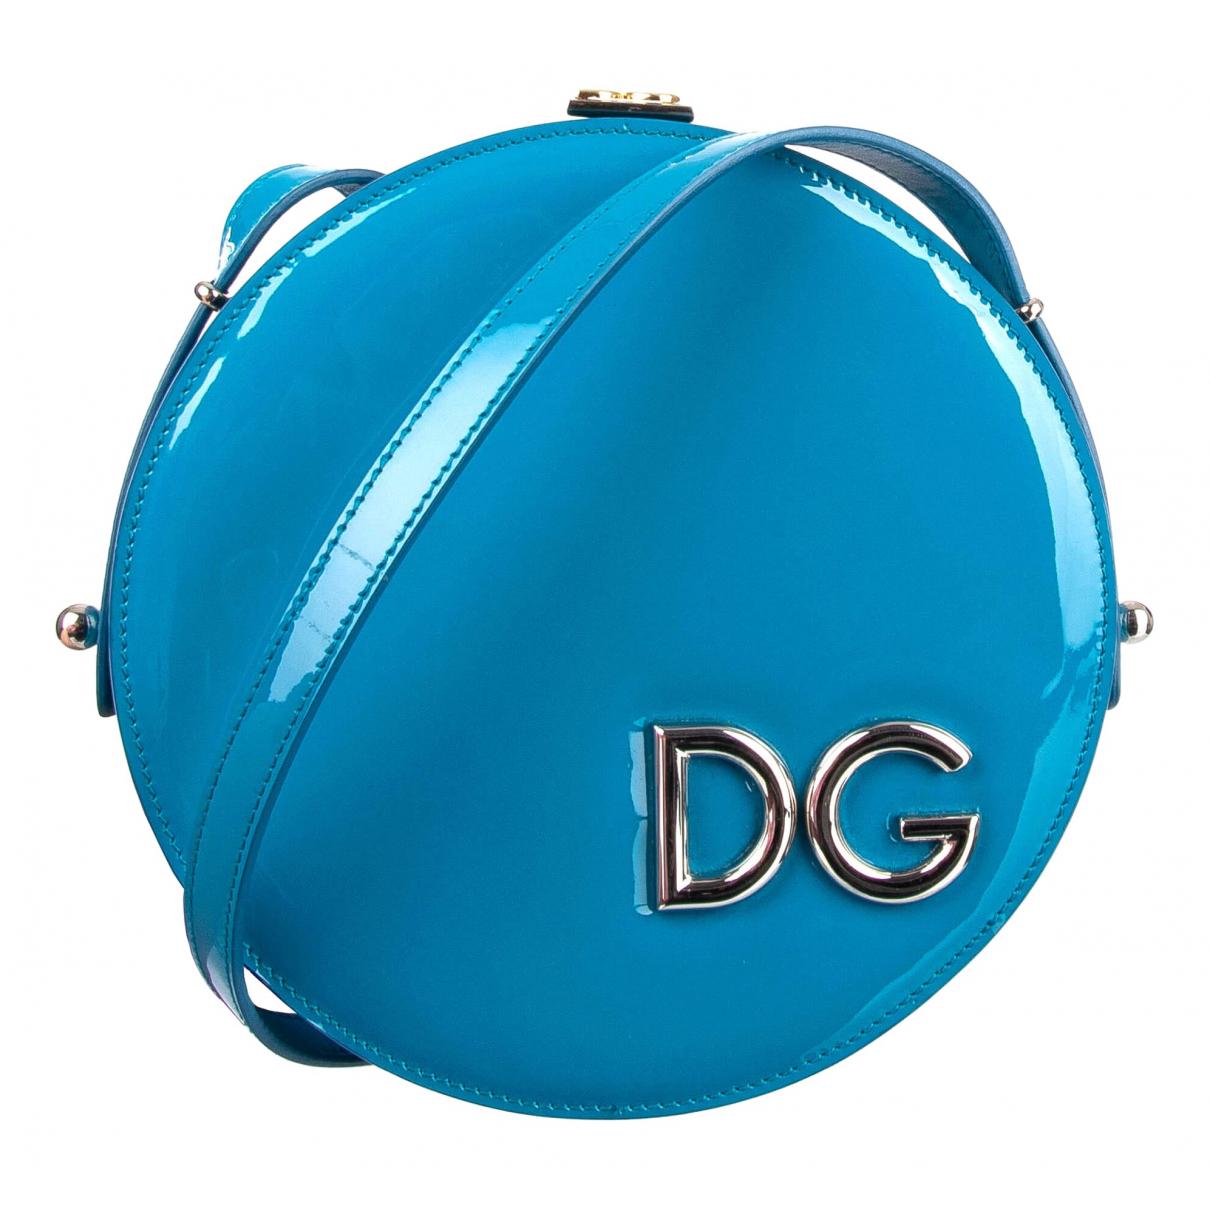 Dolce & Gabbana \N Blue Patent leather handbag for Women \N